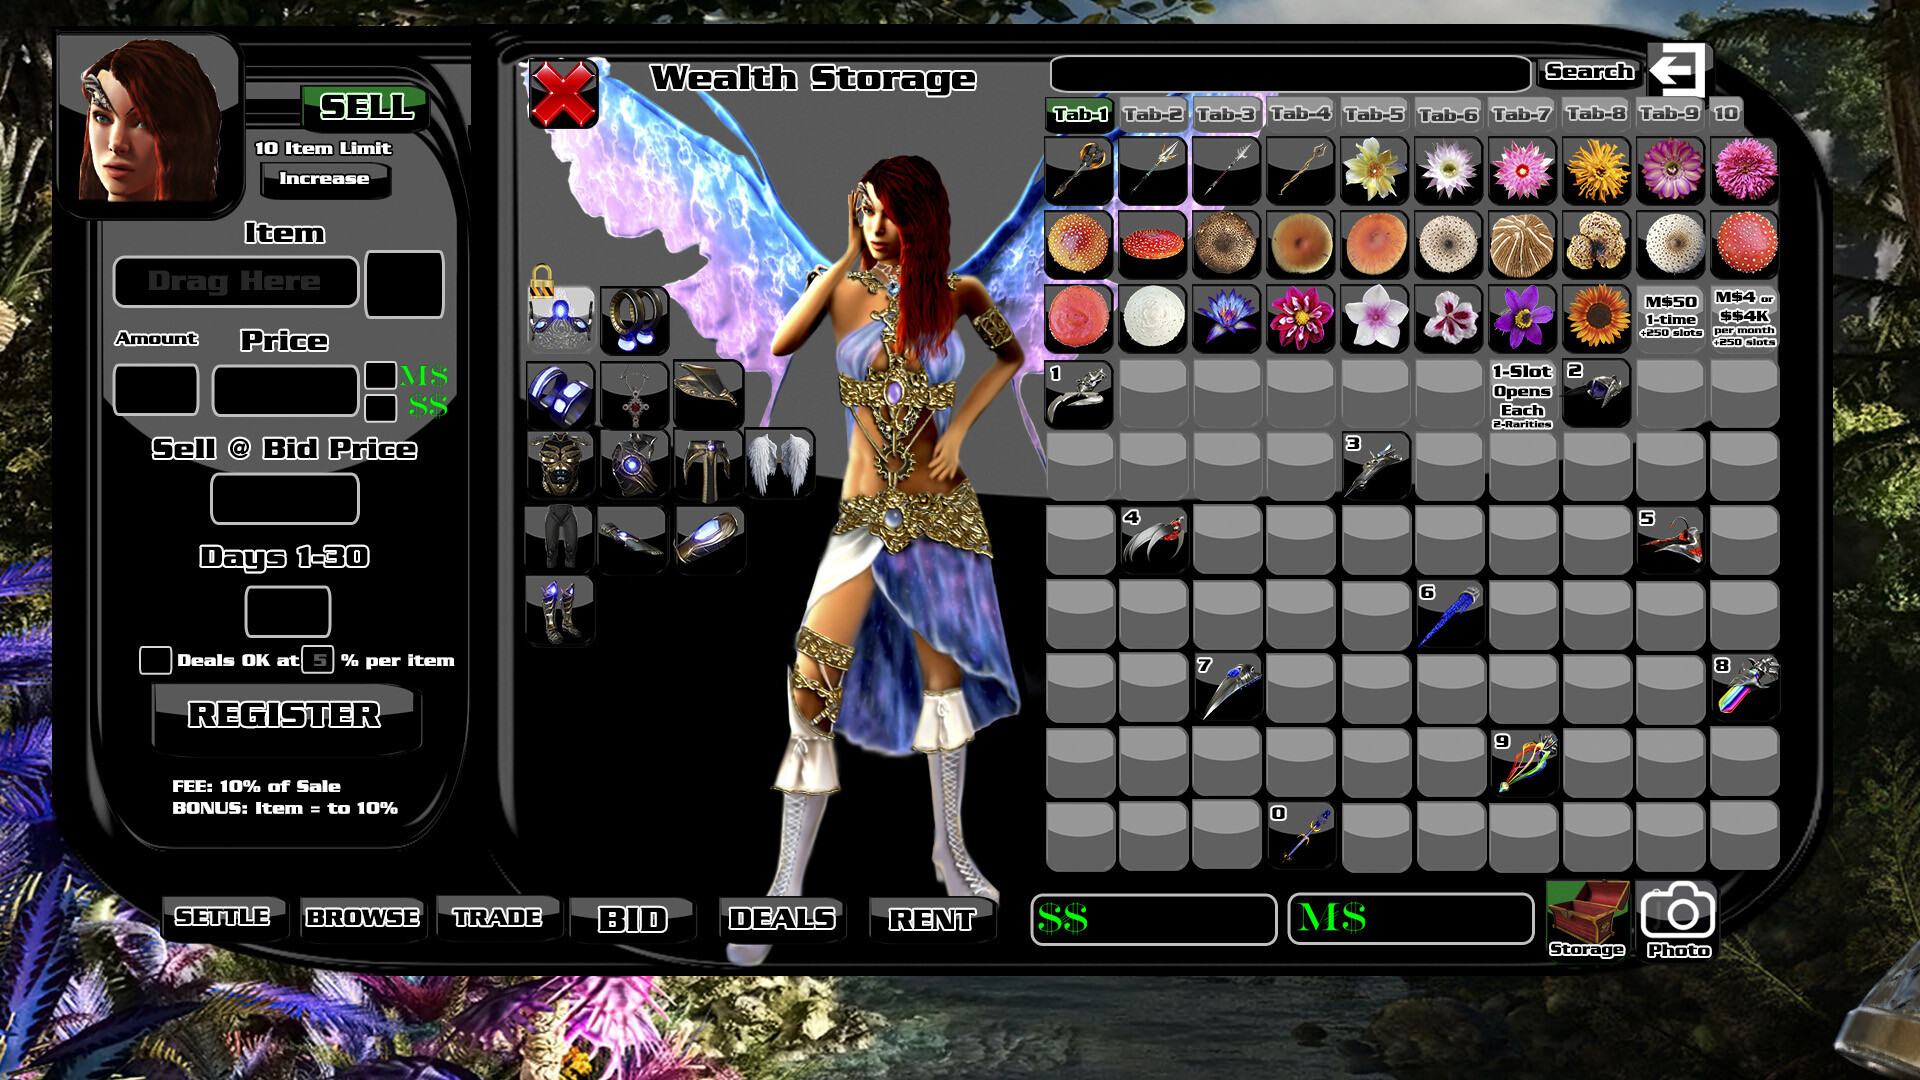 ArtStation - Unreal Engine 4 THUNDER Video Game Development Update